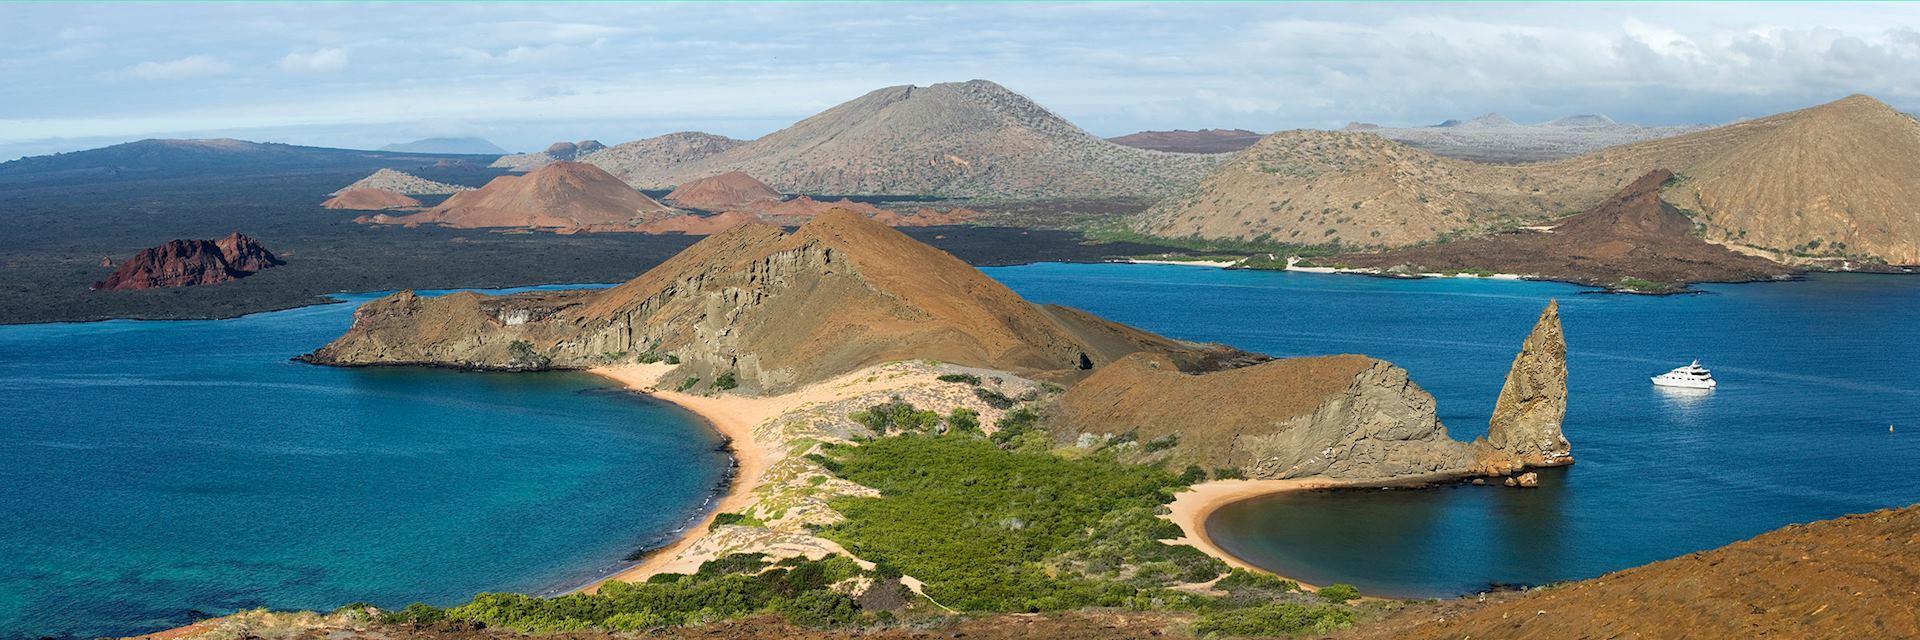 Bartolome Island, the Galapagos Islands